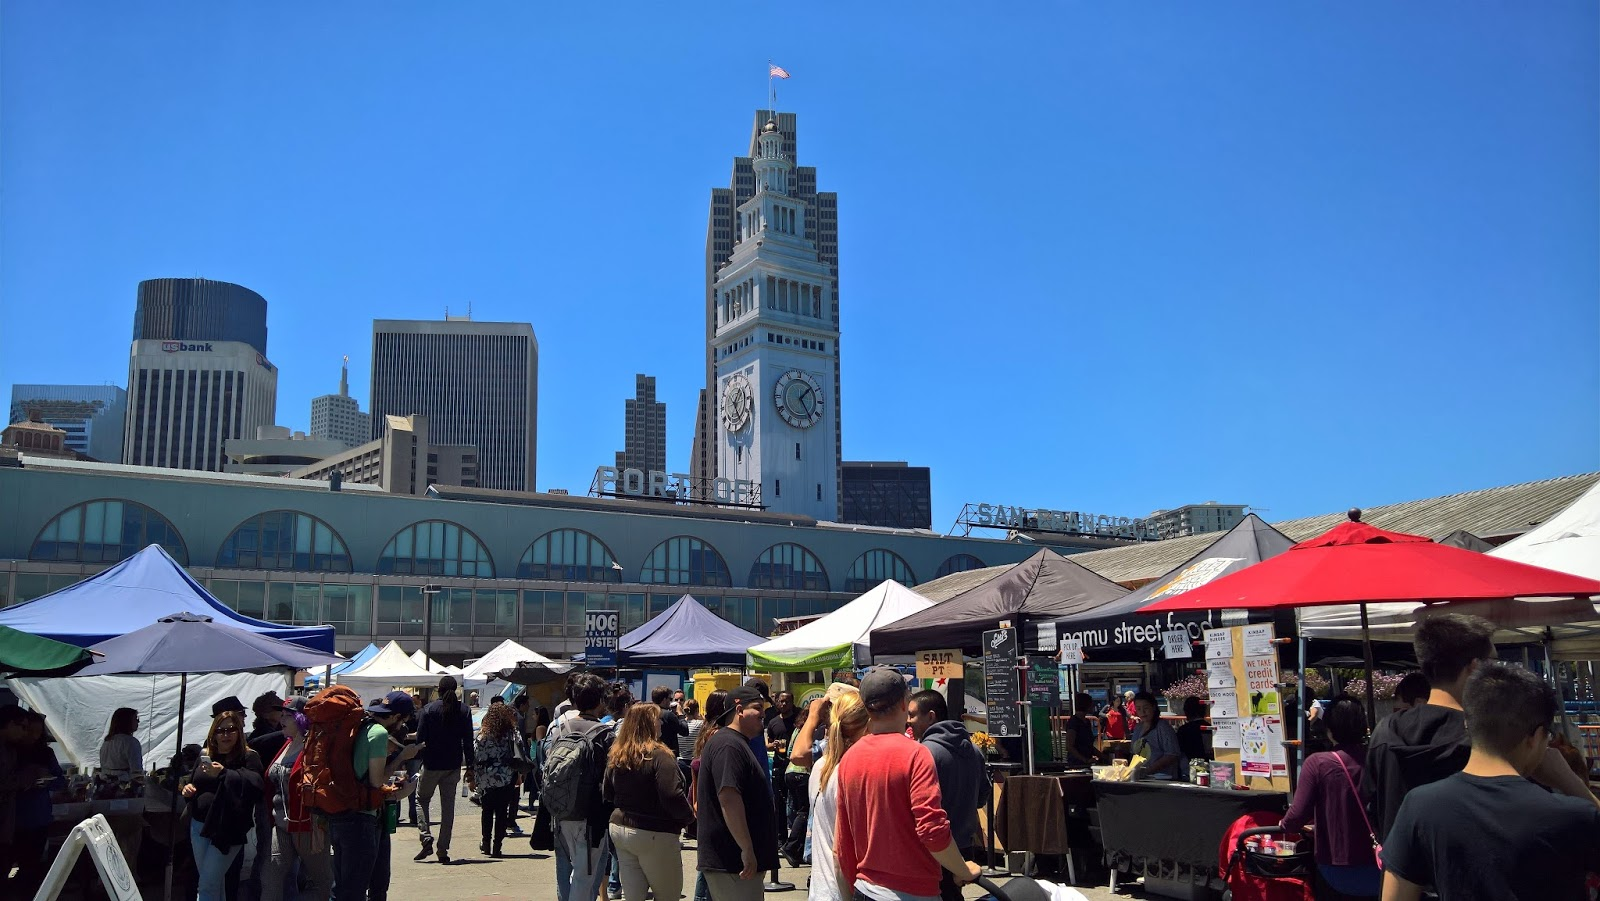 Ferry Building farmer's market San Francisco Kalifornia matkailu matkakohde matkajuttu mallaspulla